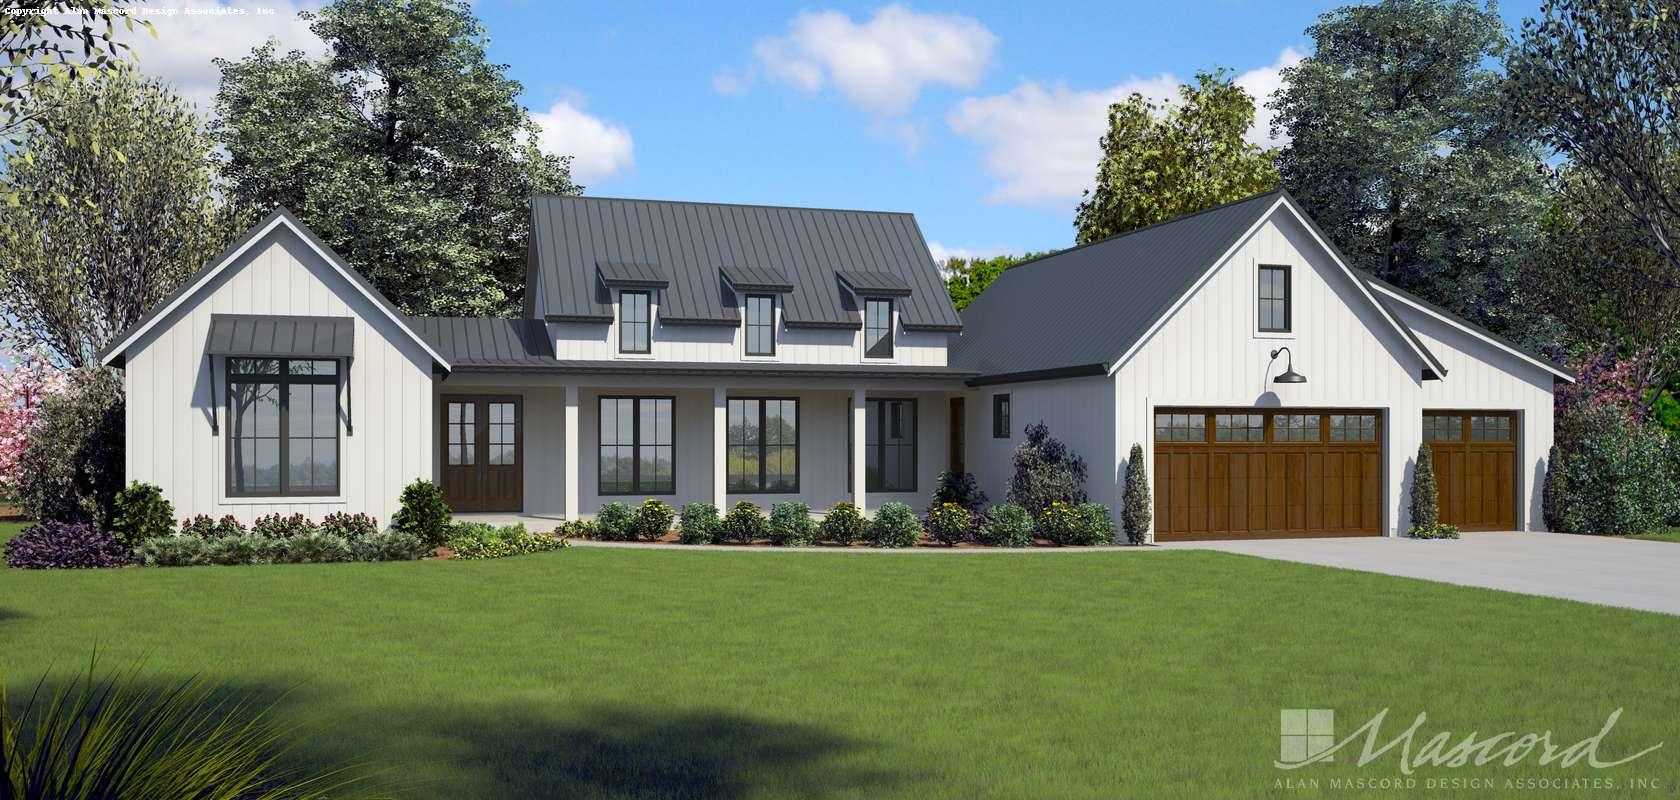 House Plans Floor Plans Custom Home Design Services